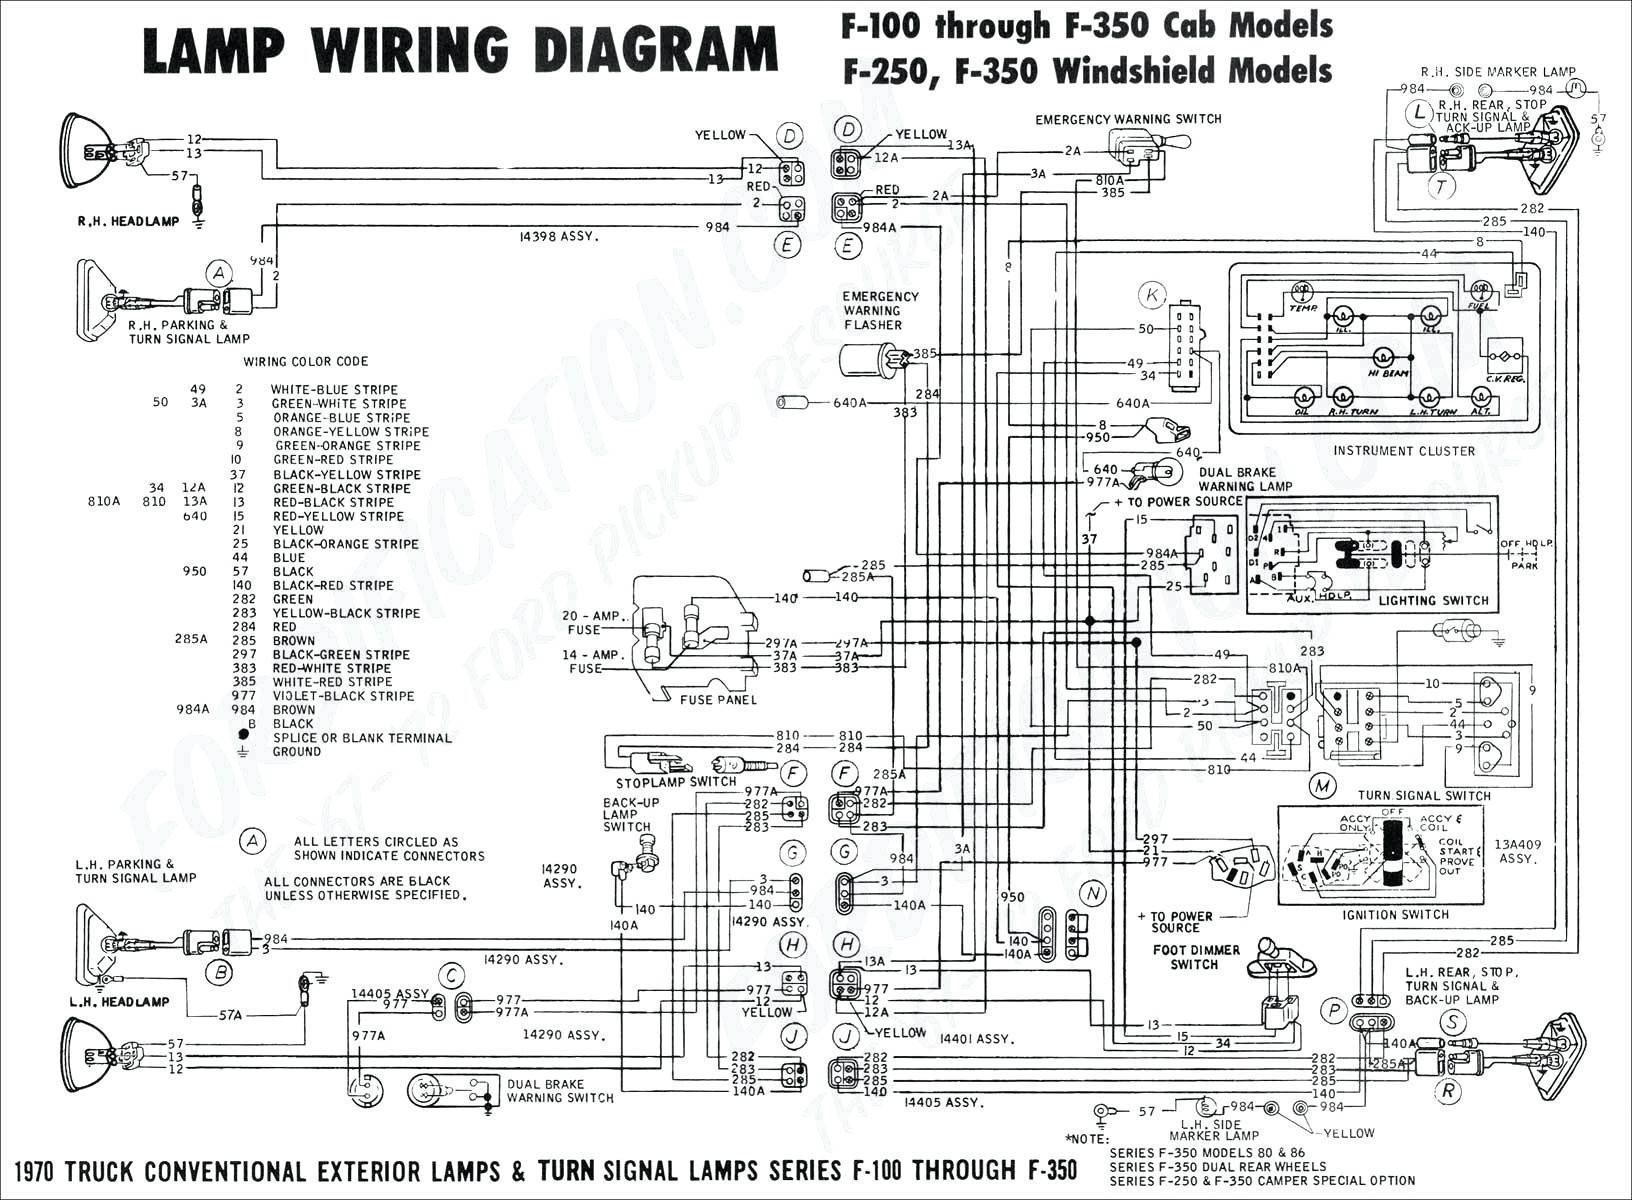 2001 Chevy Suburban Parts Diagram 2011 Chevrolet Suburban